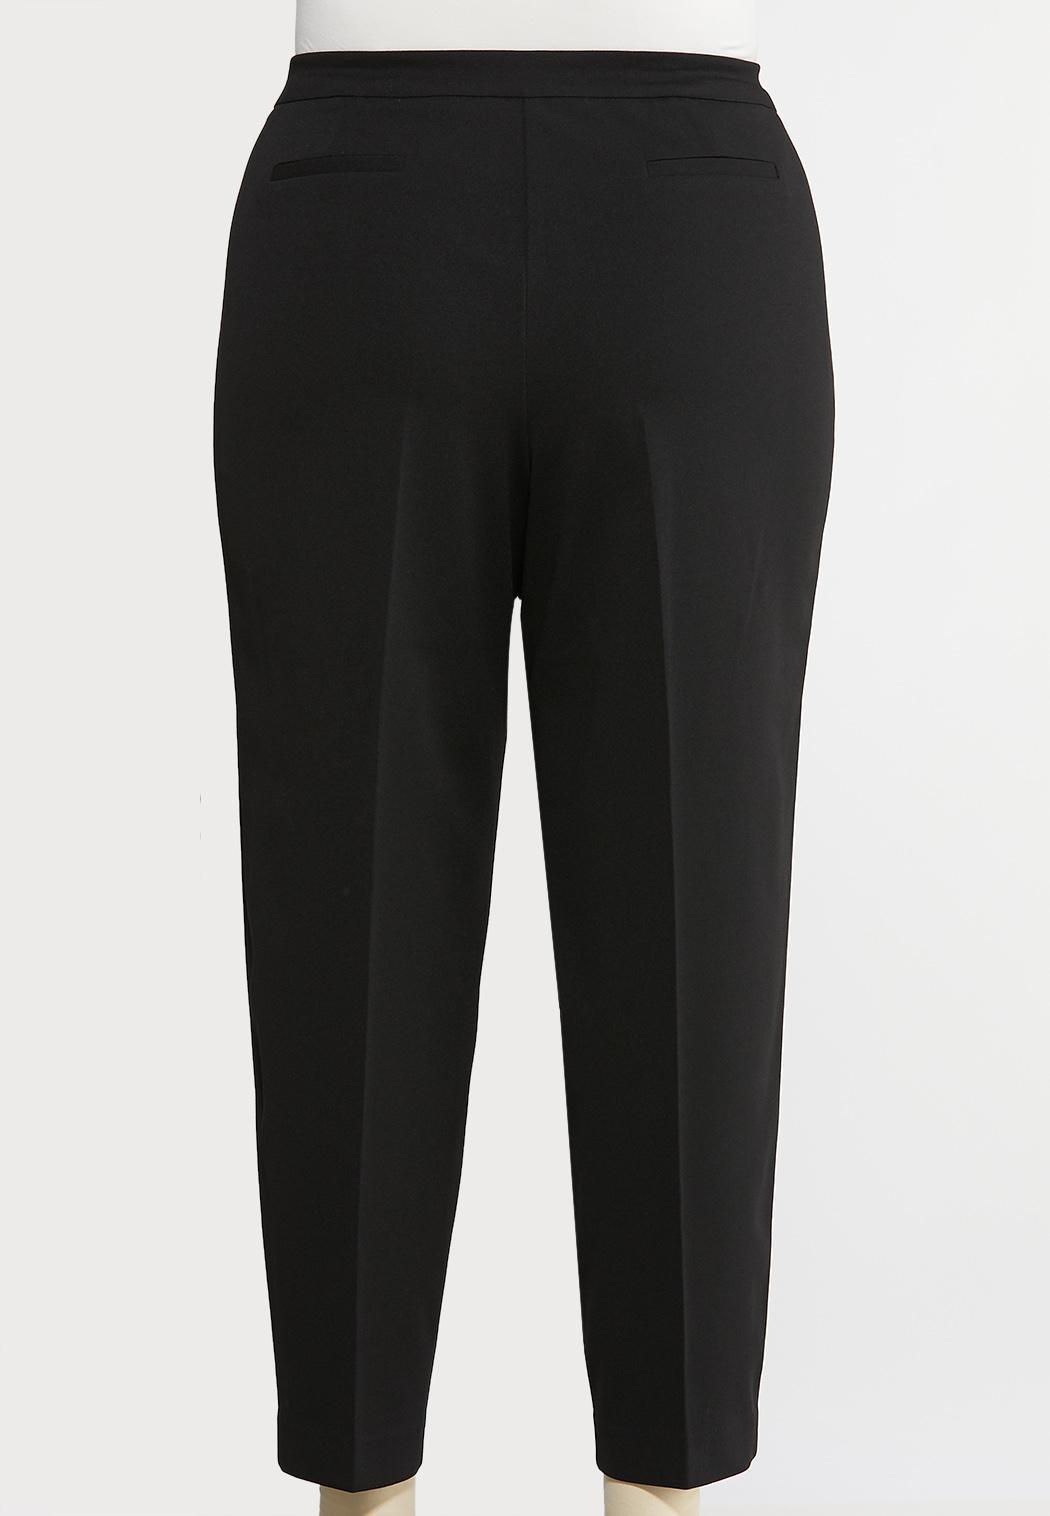 Plus Petite Slim Leg Dressy Knit Pants (Item #43892504)